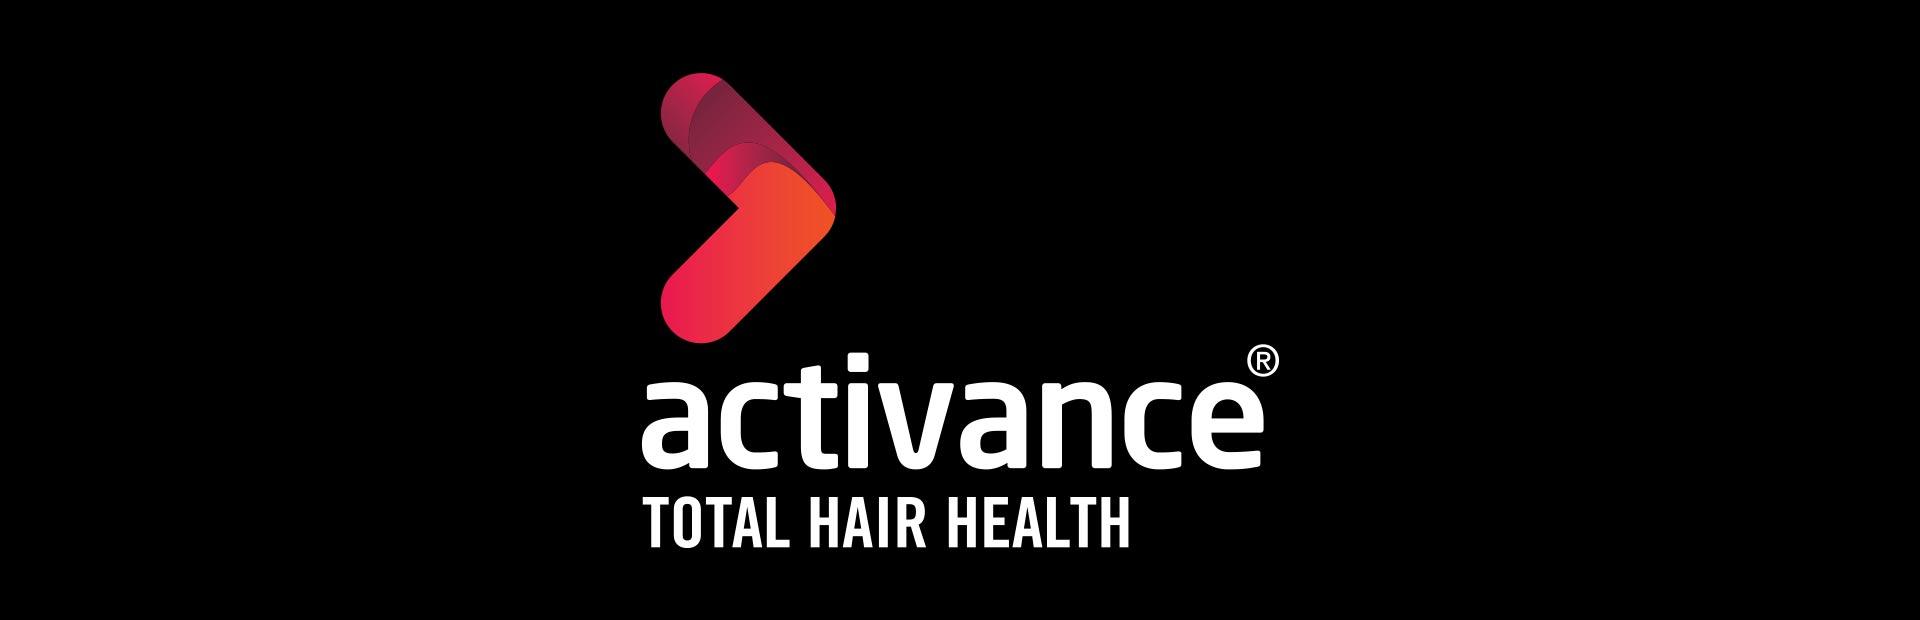 activance-hero-2018